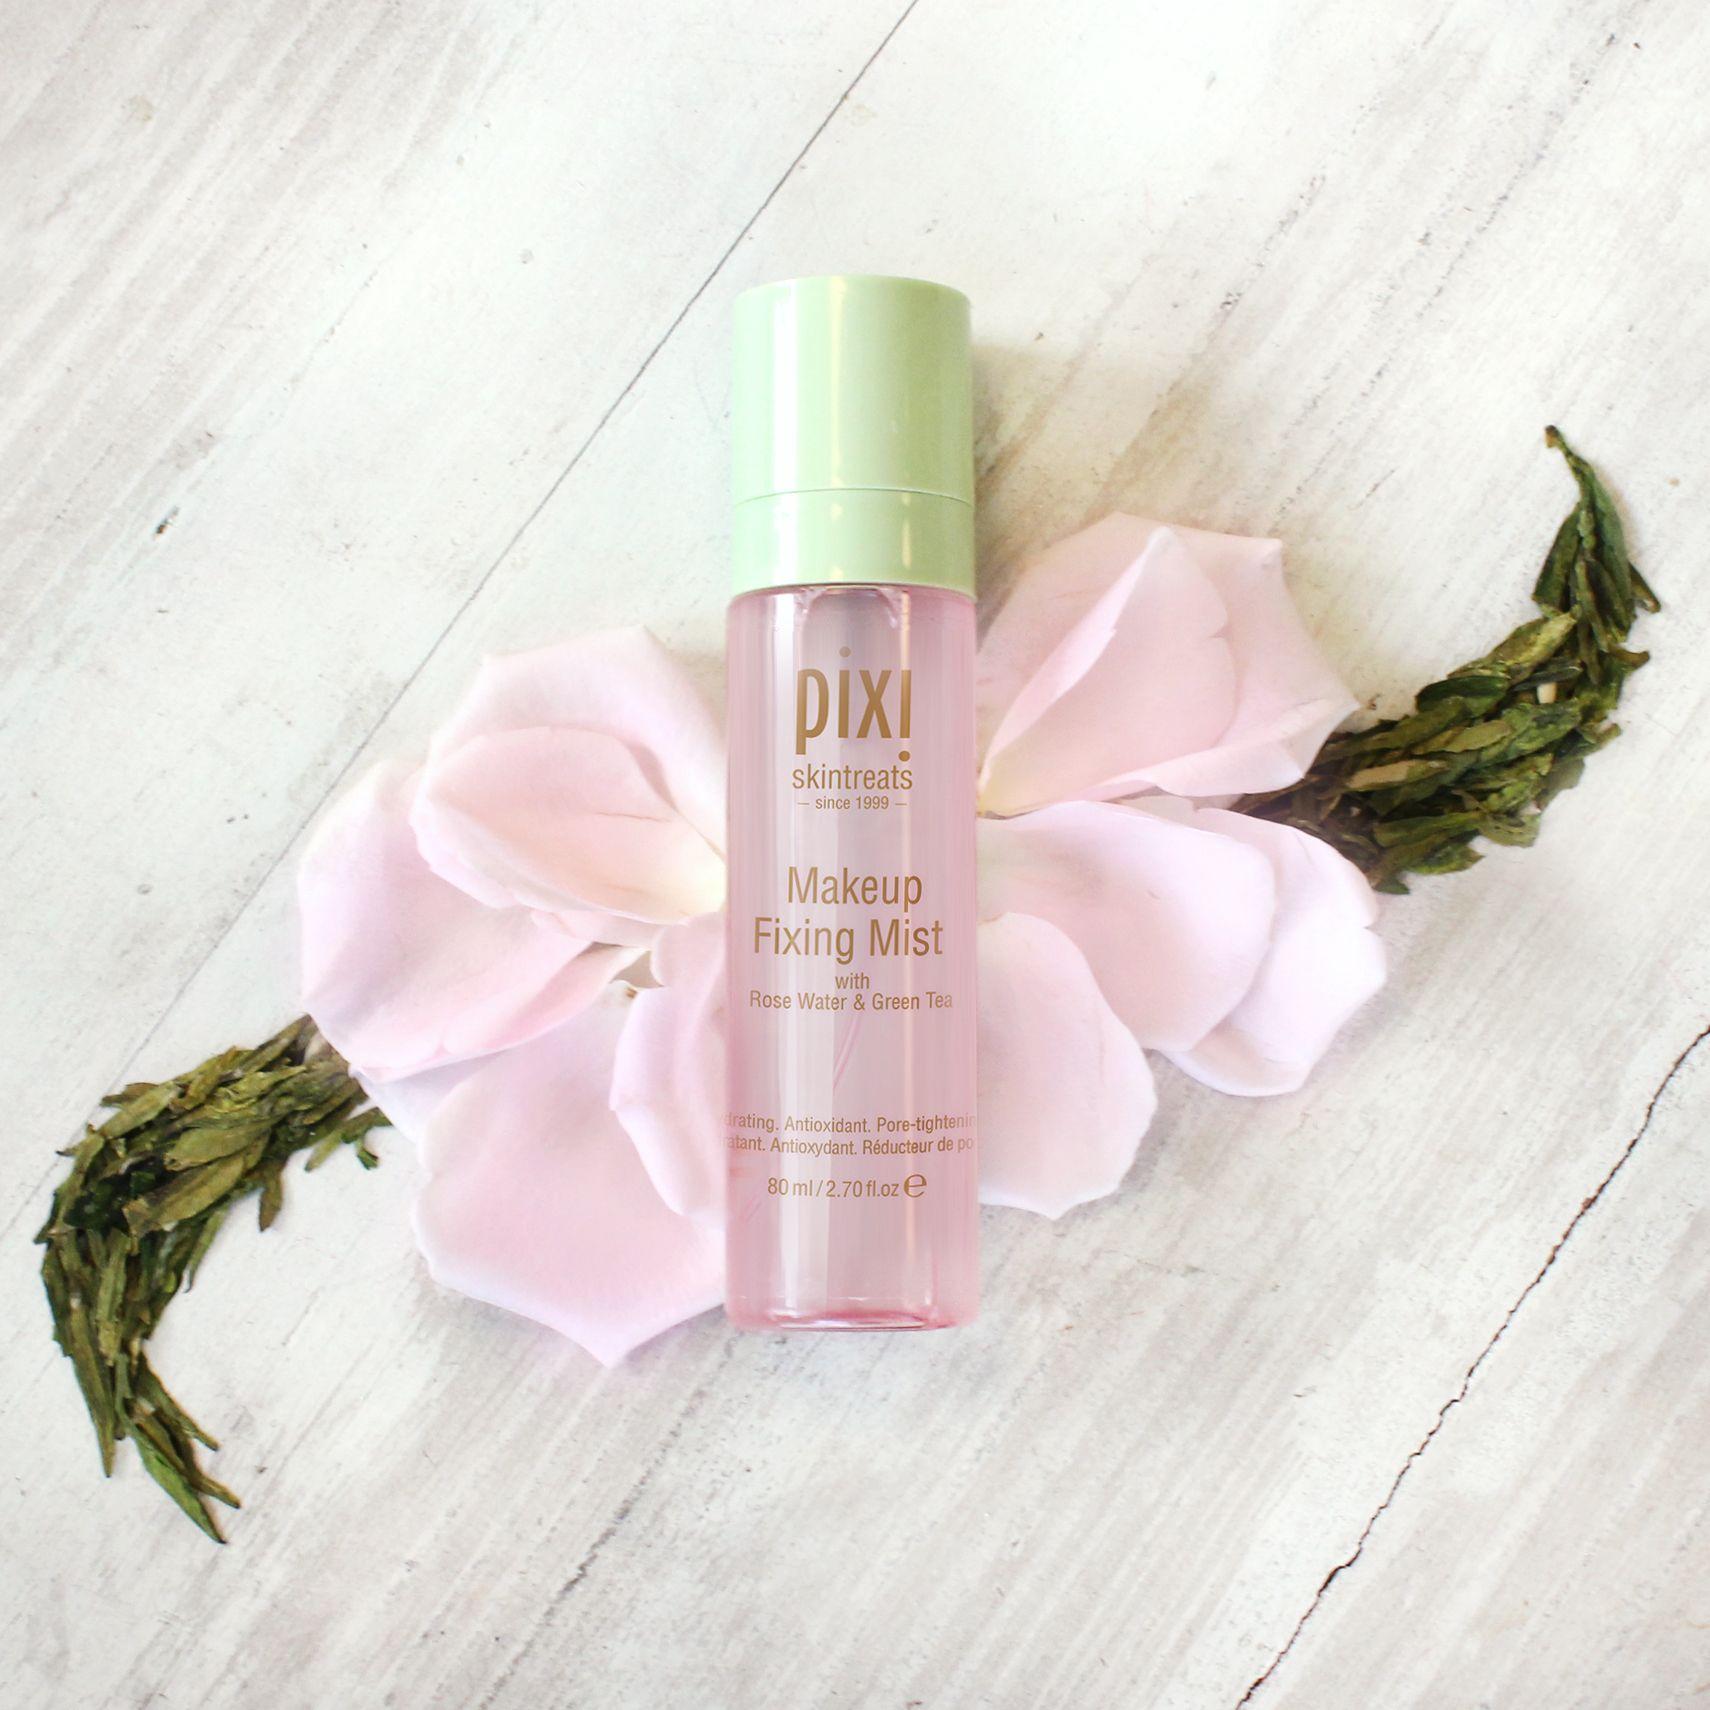 Makeup Fixing Mist Pixie makeup, Mists, Rose water